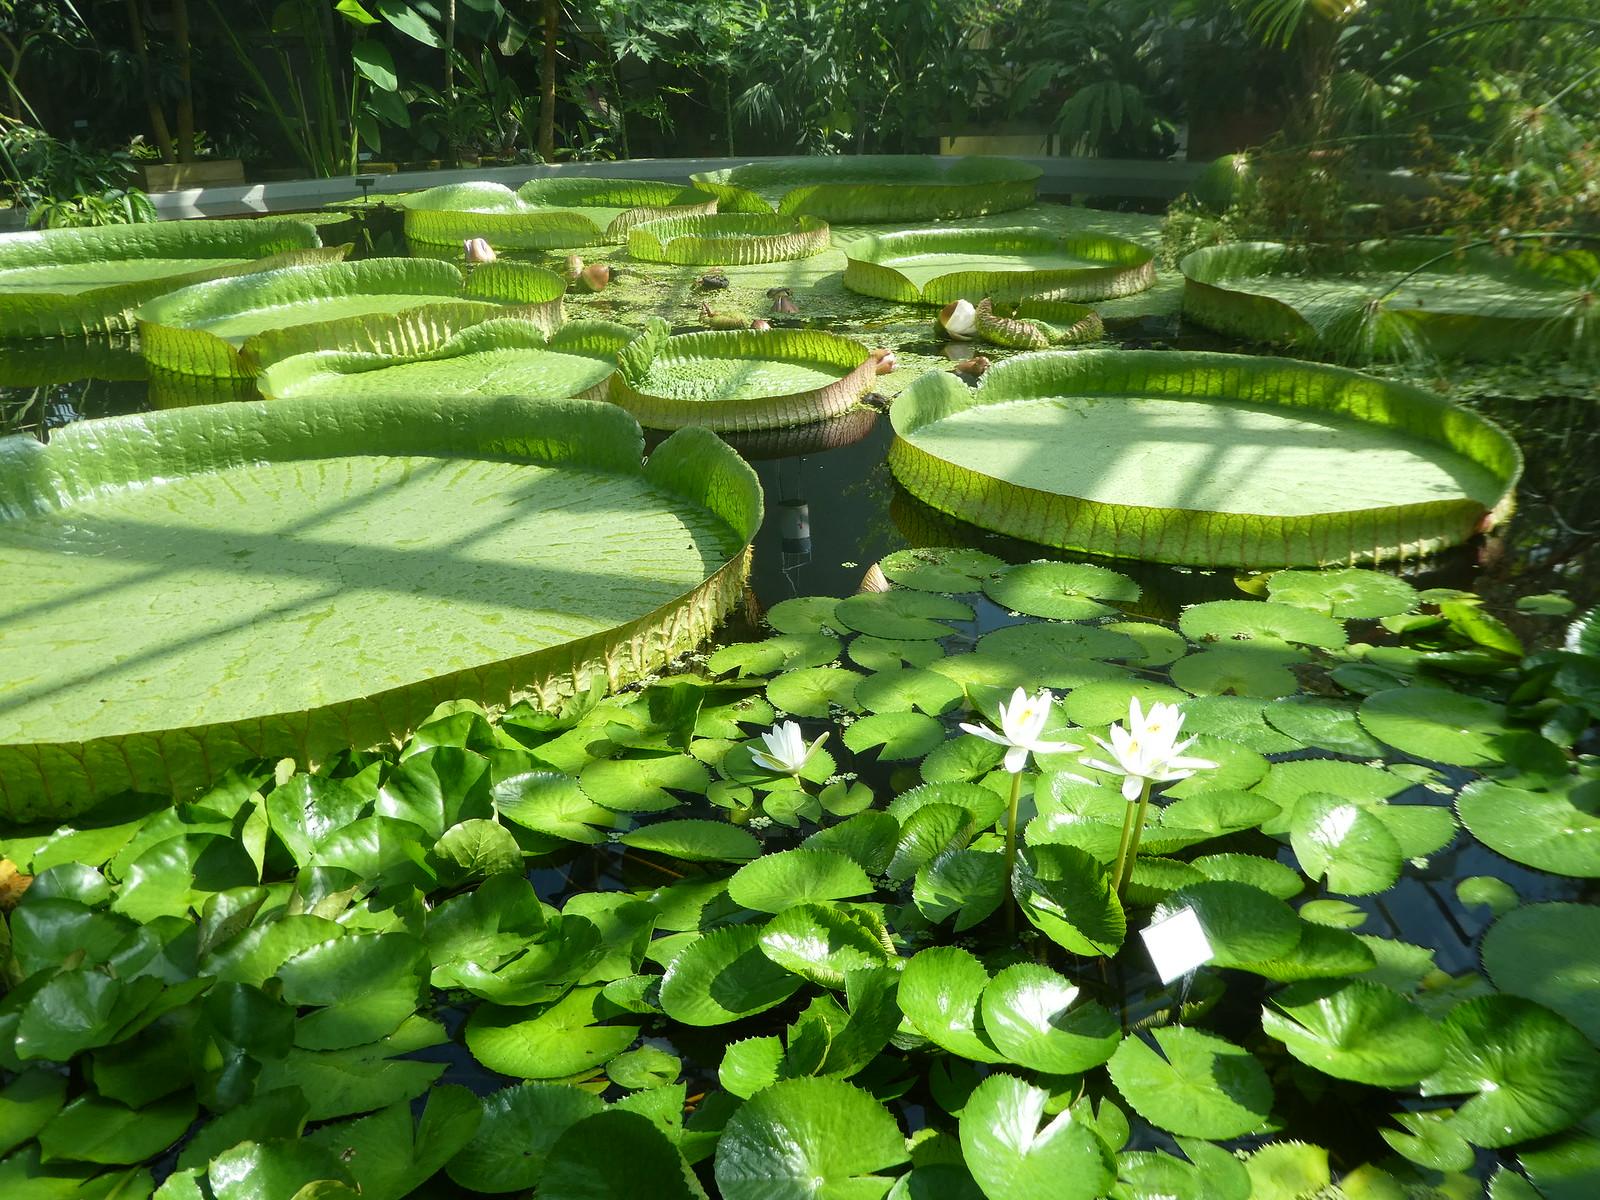 Victoria Amazonia Giant Water Lilies, Uppsala Botanic Garden